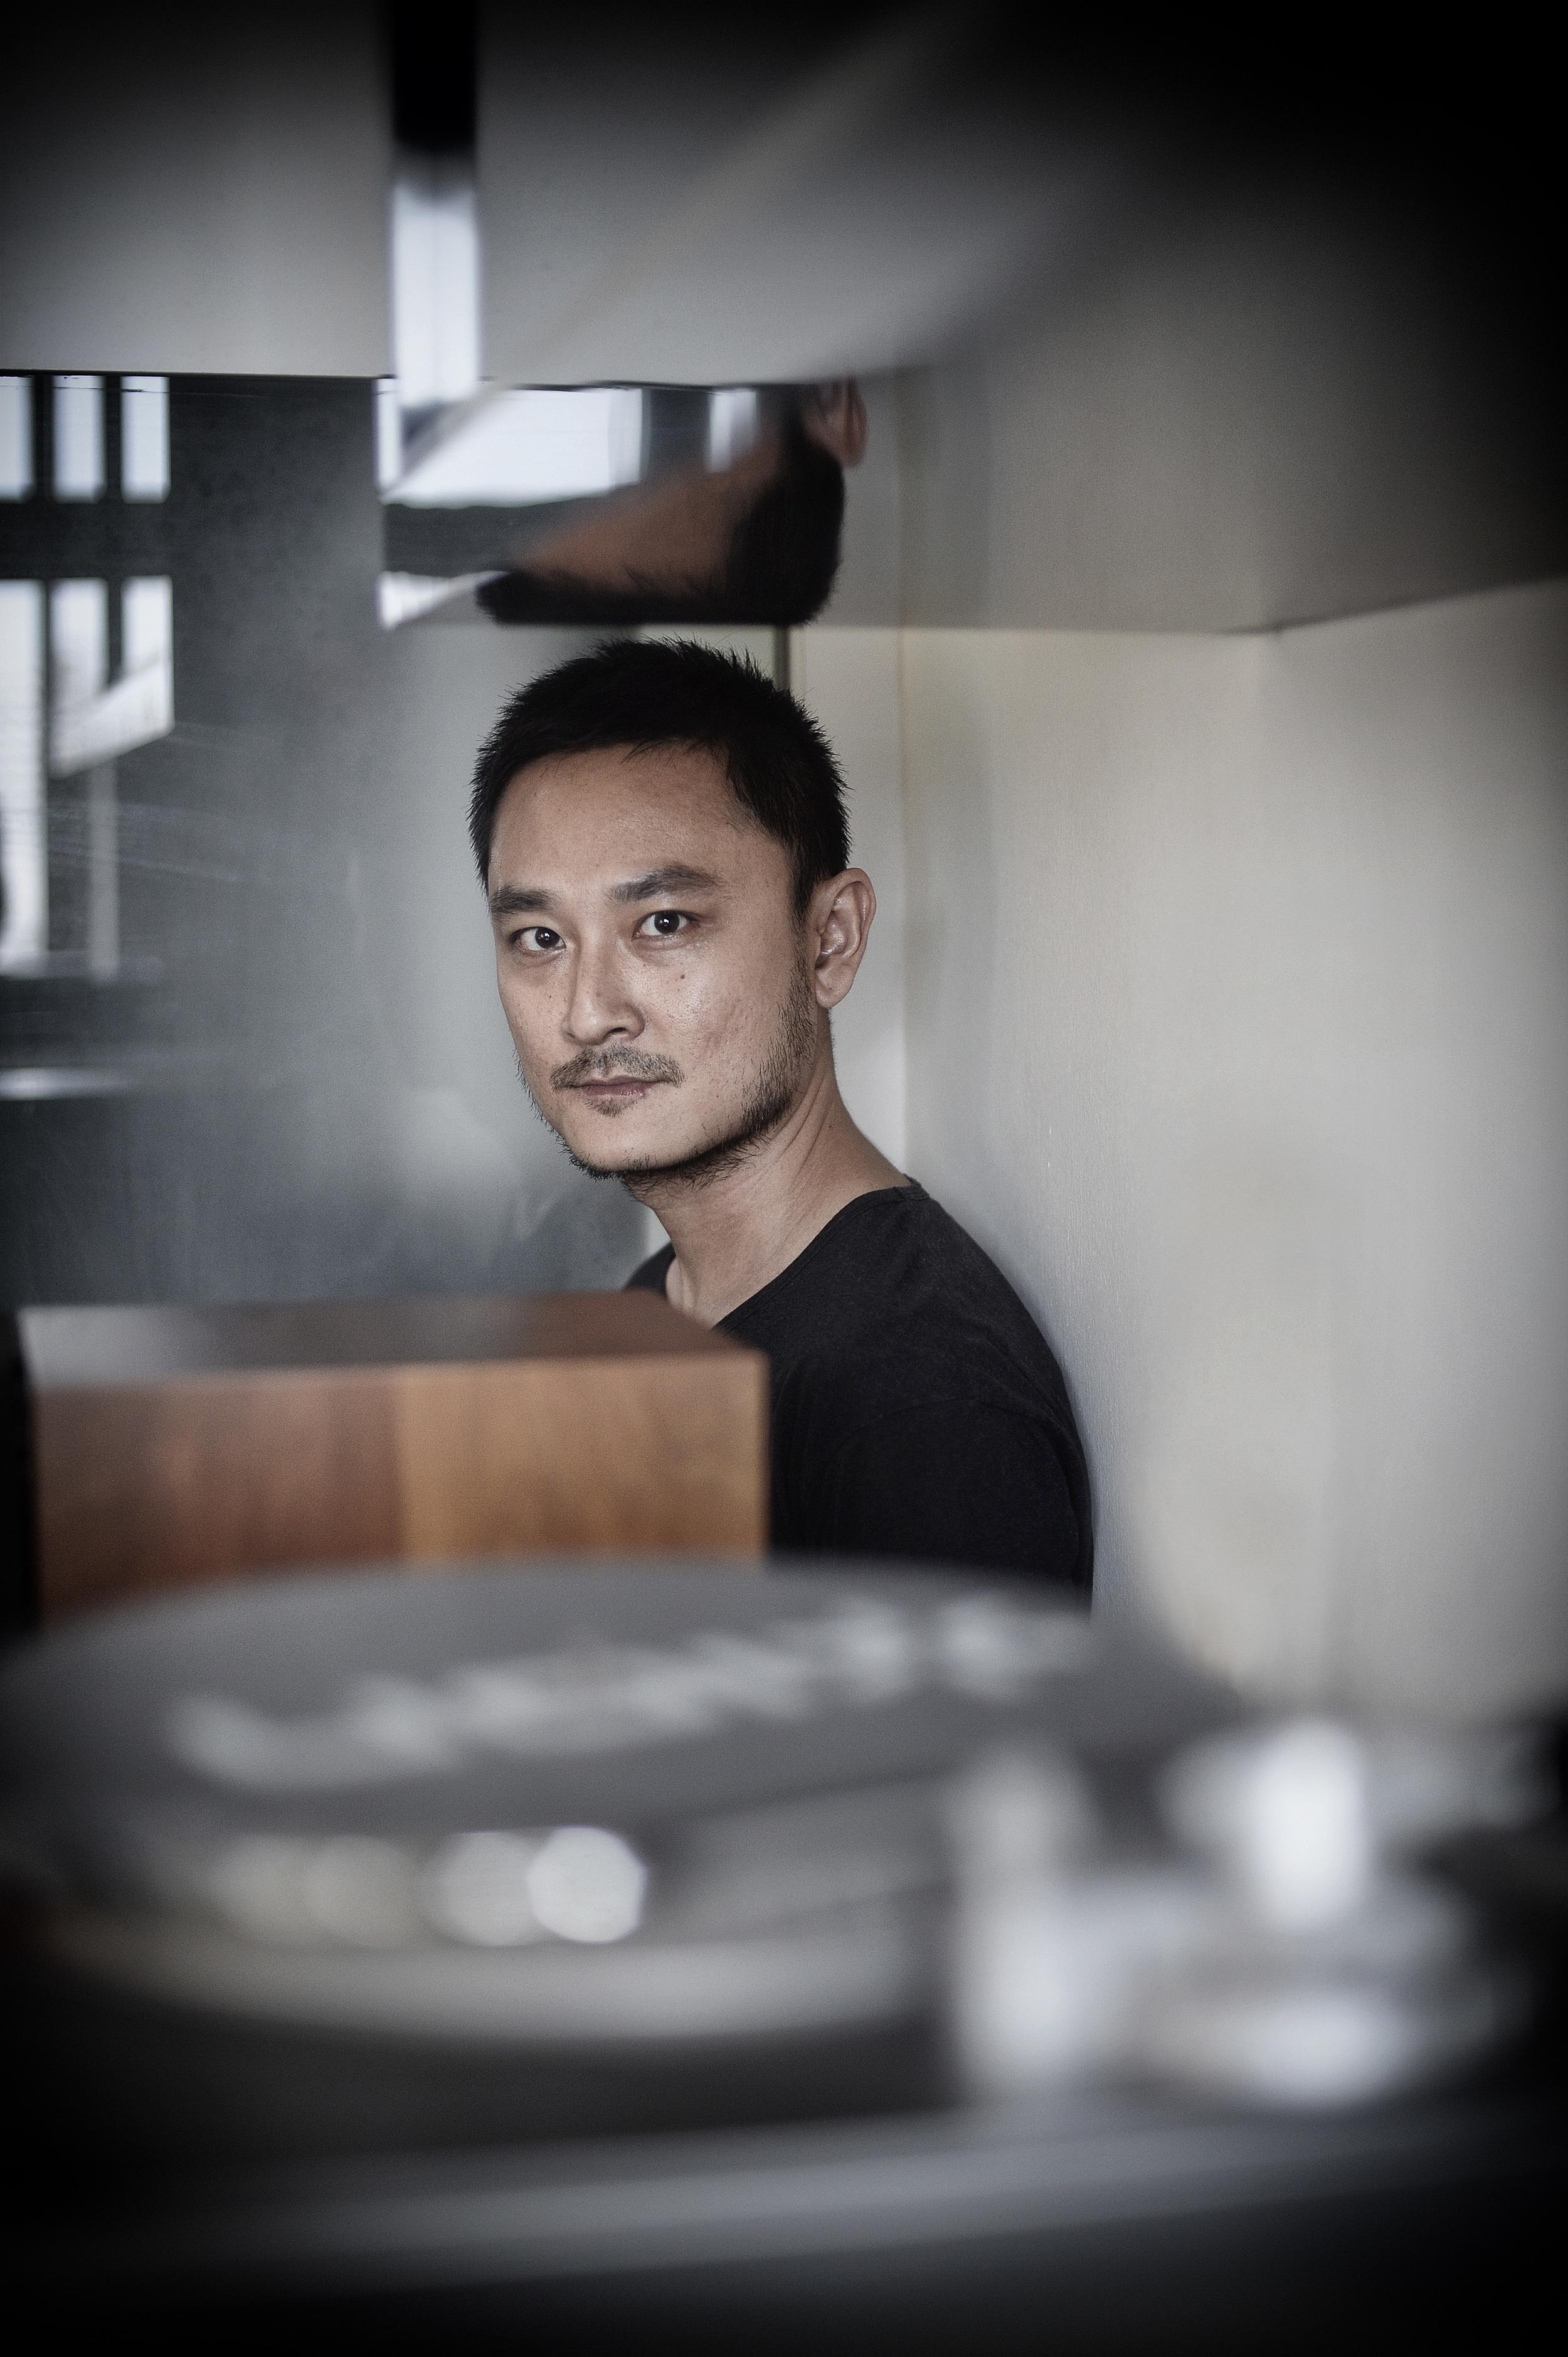 Designer/DJ Daniel Koh, May 12, 2013